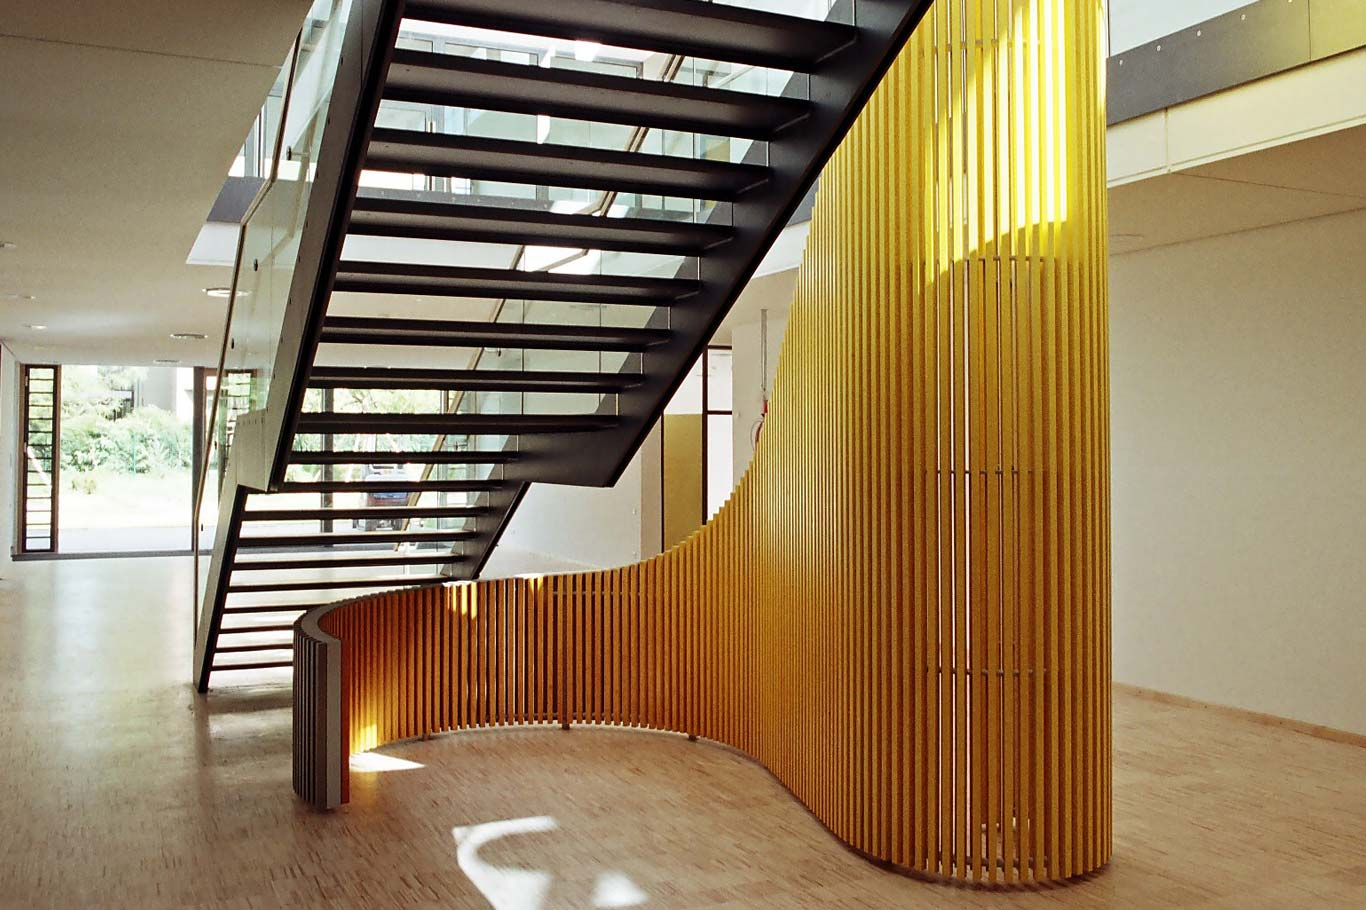 Gelbwärts Kunst am Bau